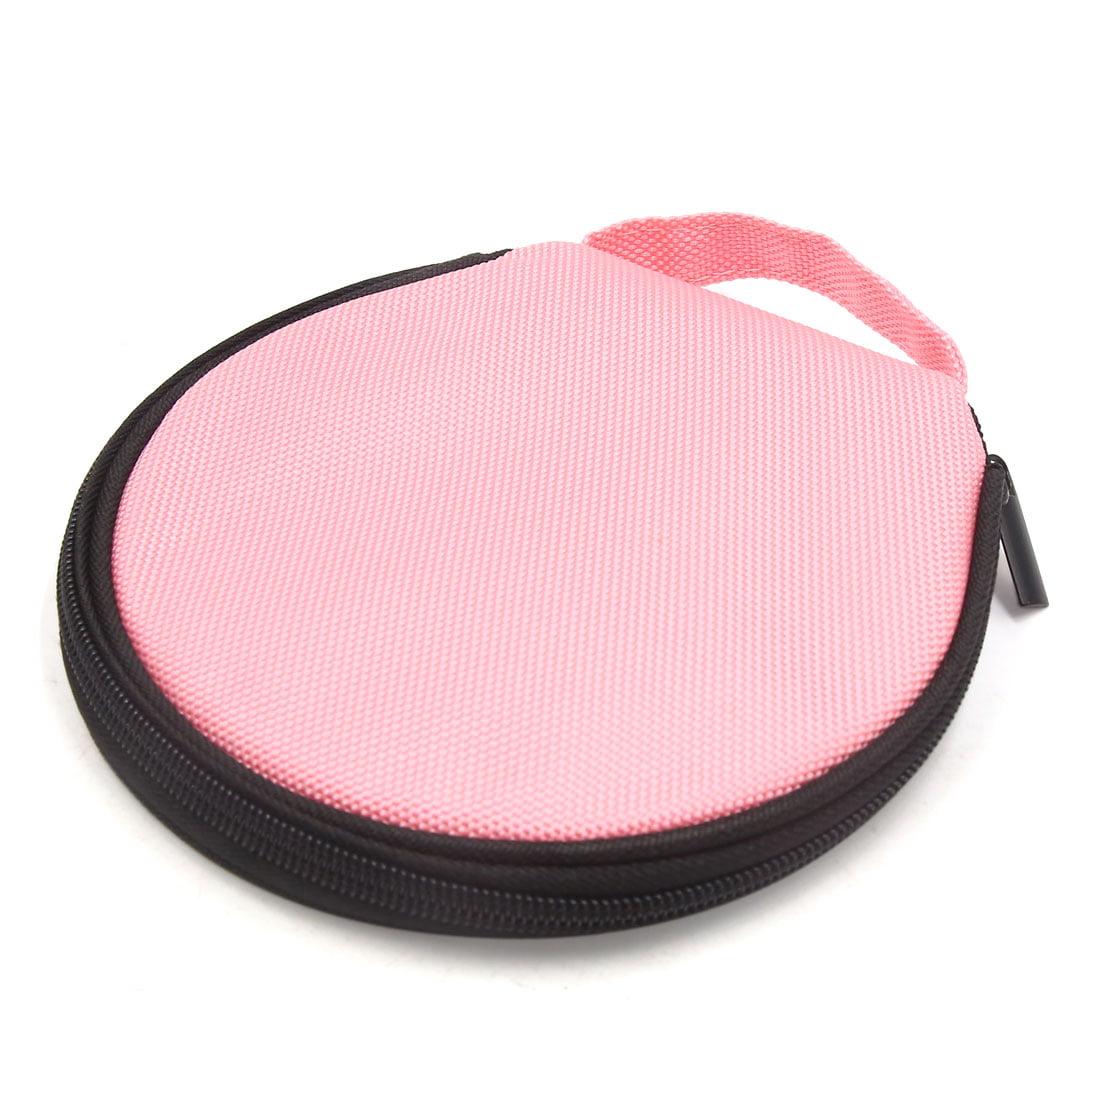 Pink Zipper Closure Round CD Discs Holder Bag Storage Carry Case Wallet for Car